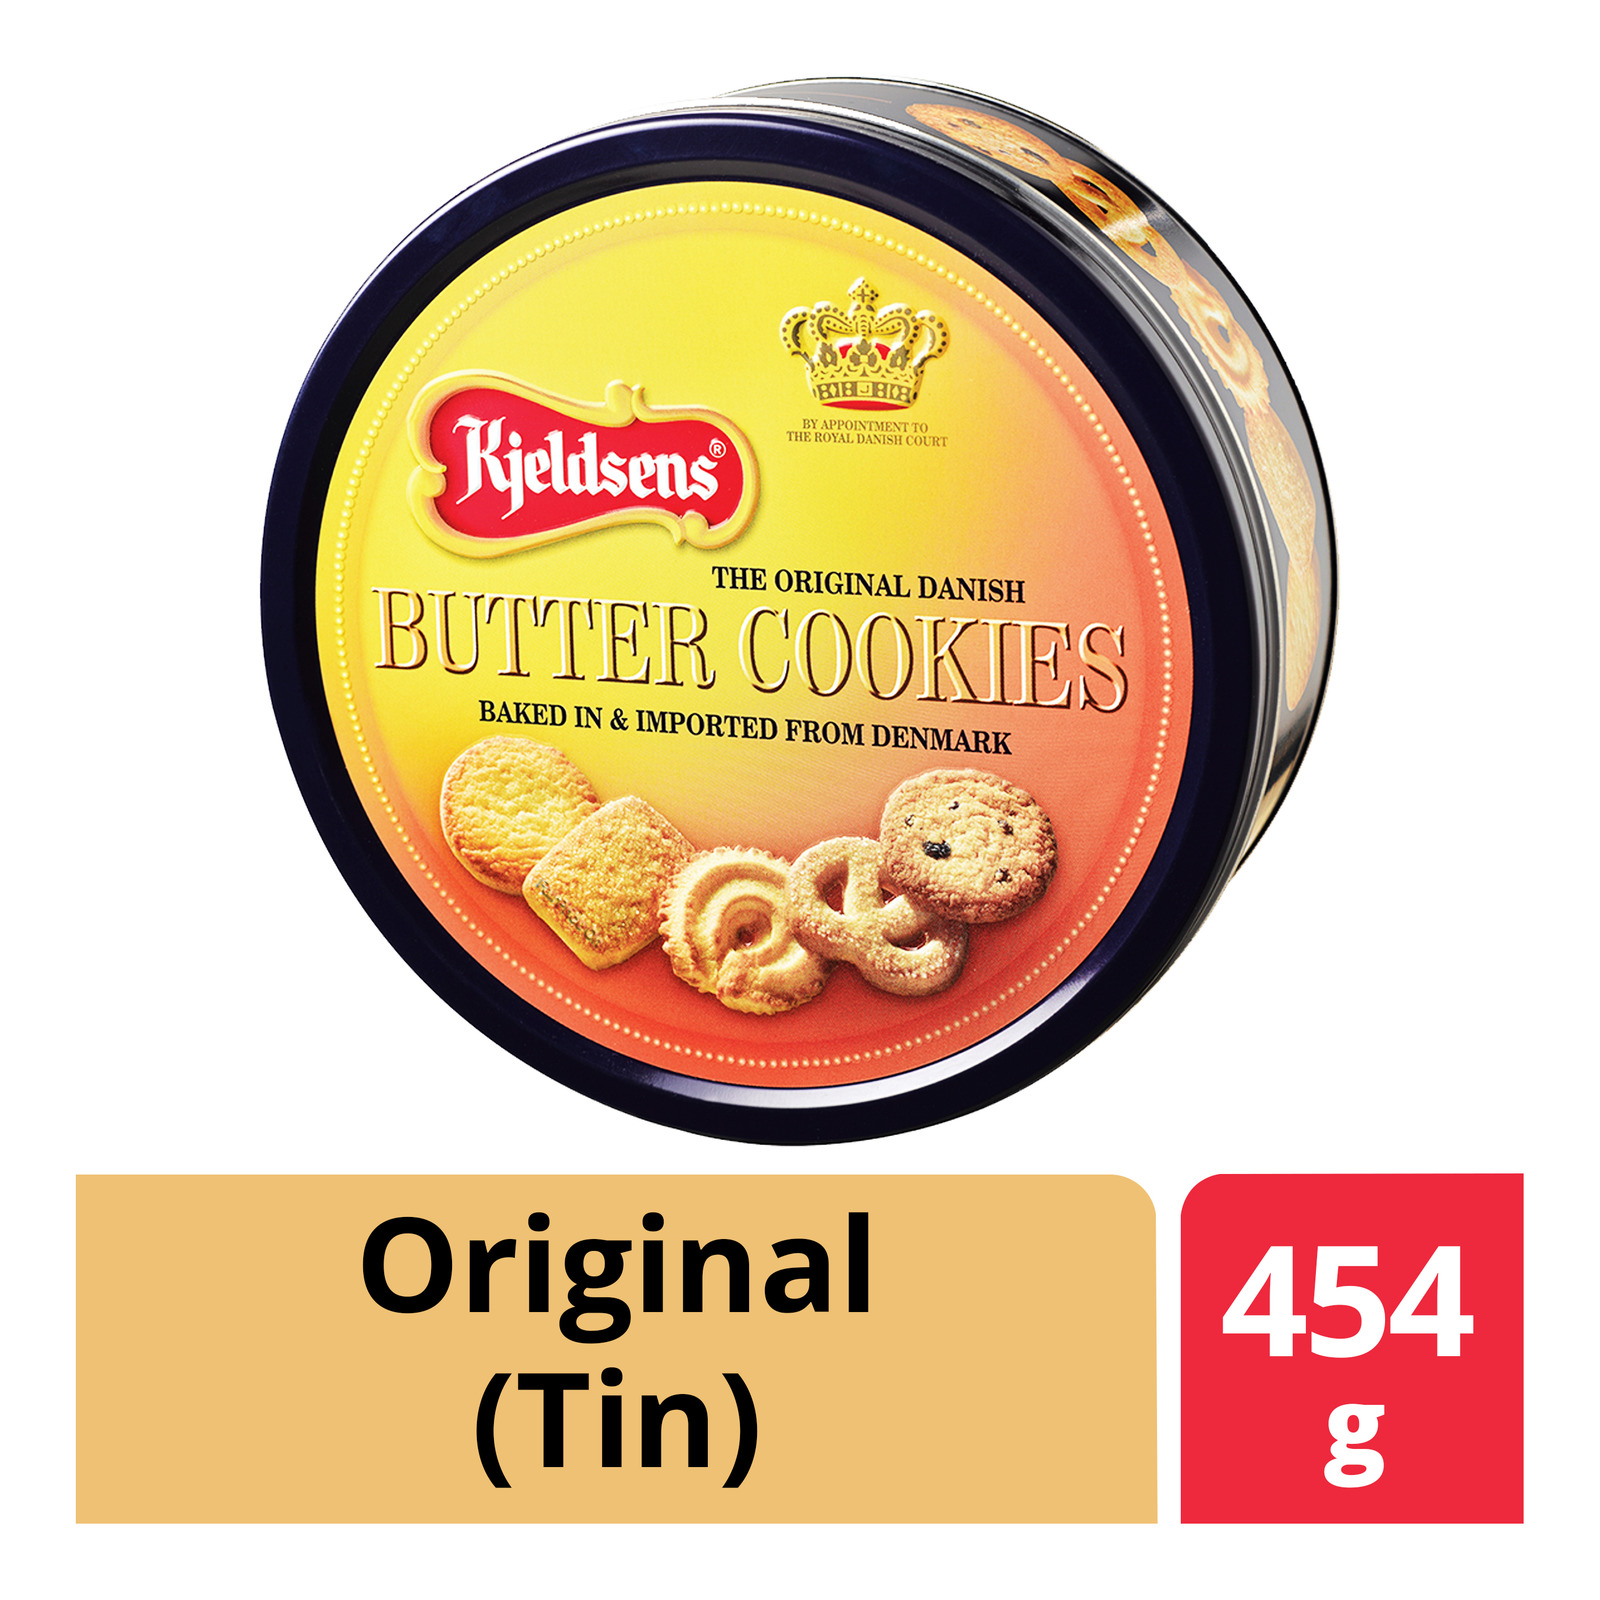 Kjeldsens Cookies Tin - Butter